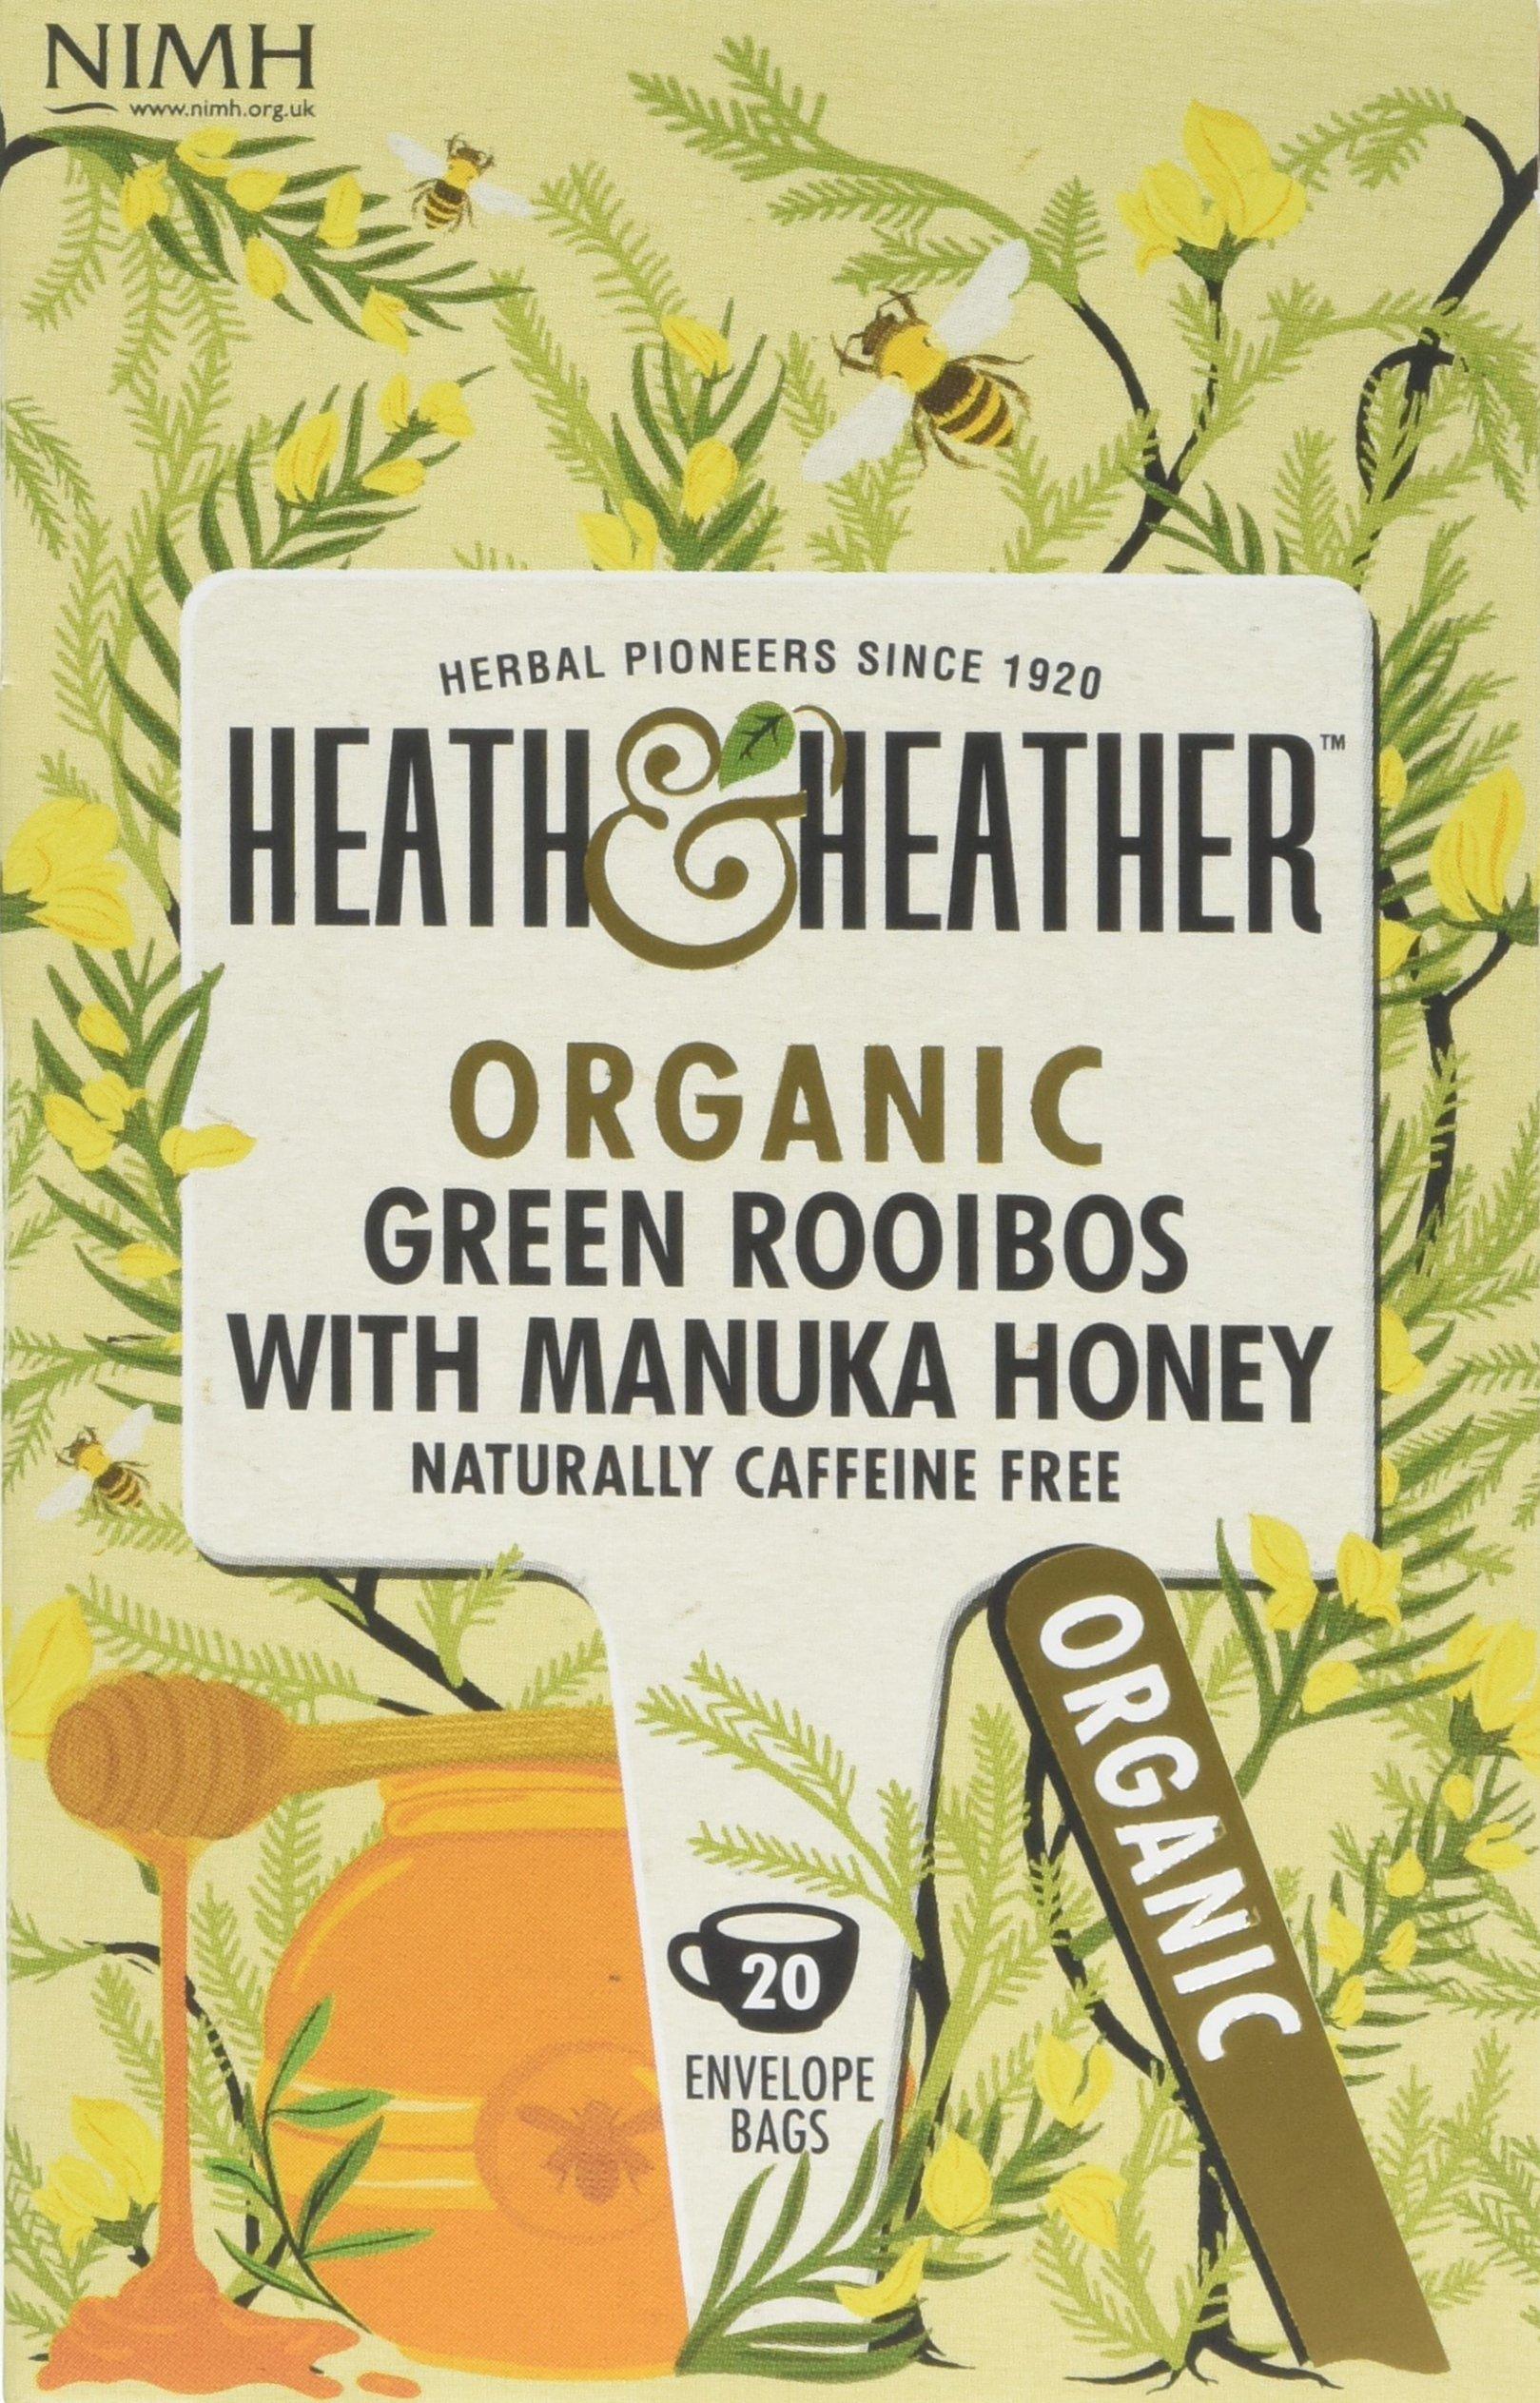 Heath & Heather organic rooibos tea bundle (soil association) (rooibos tea) (6 packs of 20 bags) (120 bags) (a sweet tea with aromas of manuka honey) (brews in 3-5 minutes)